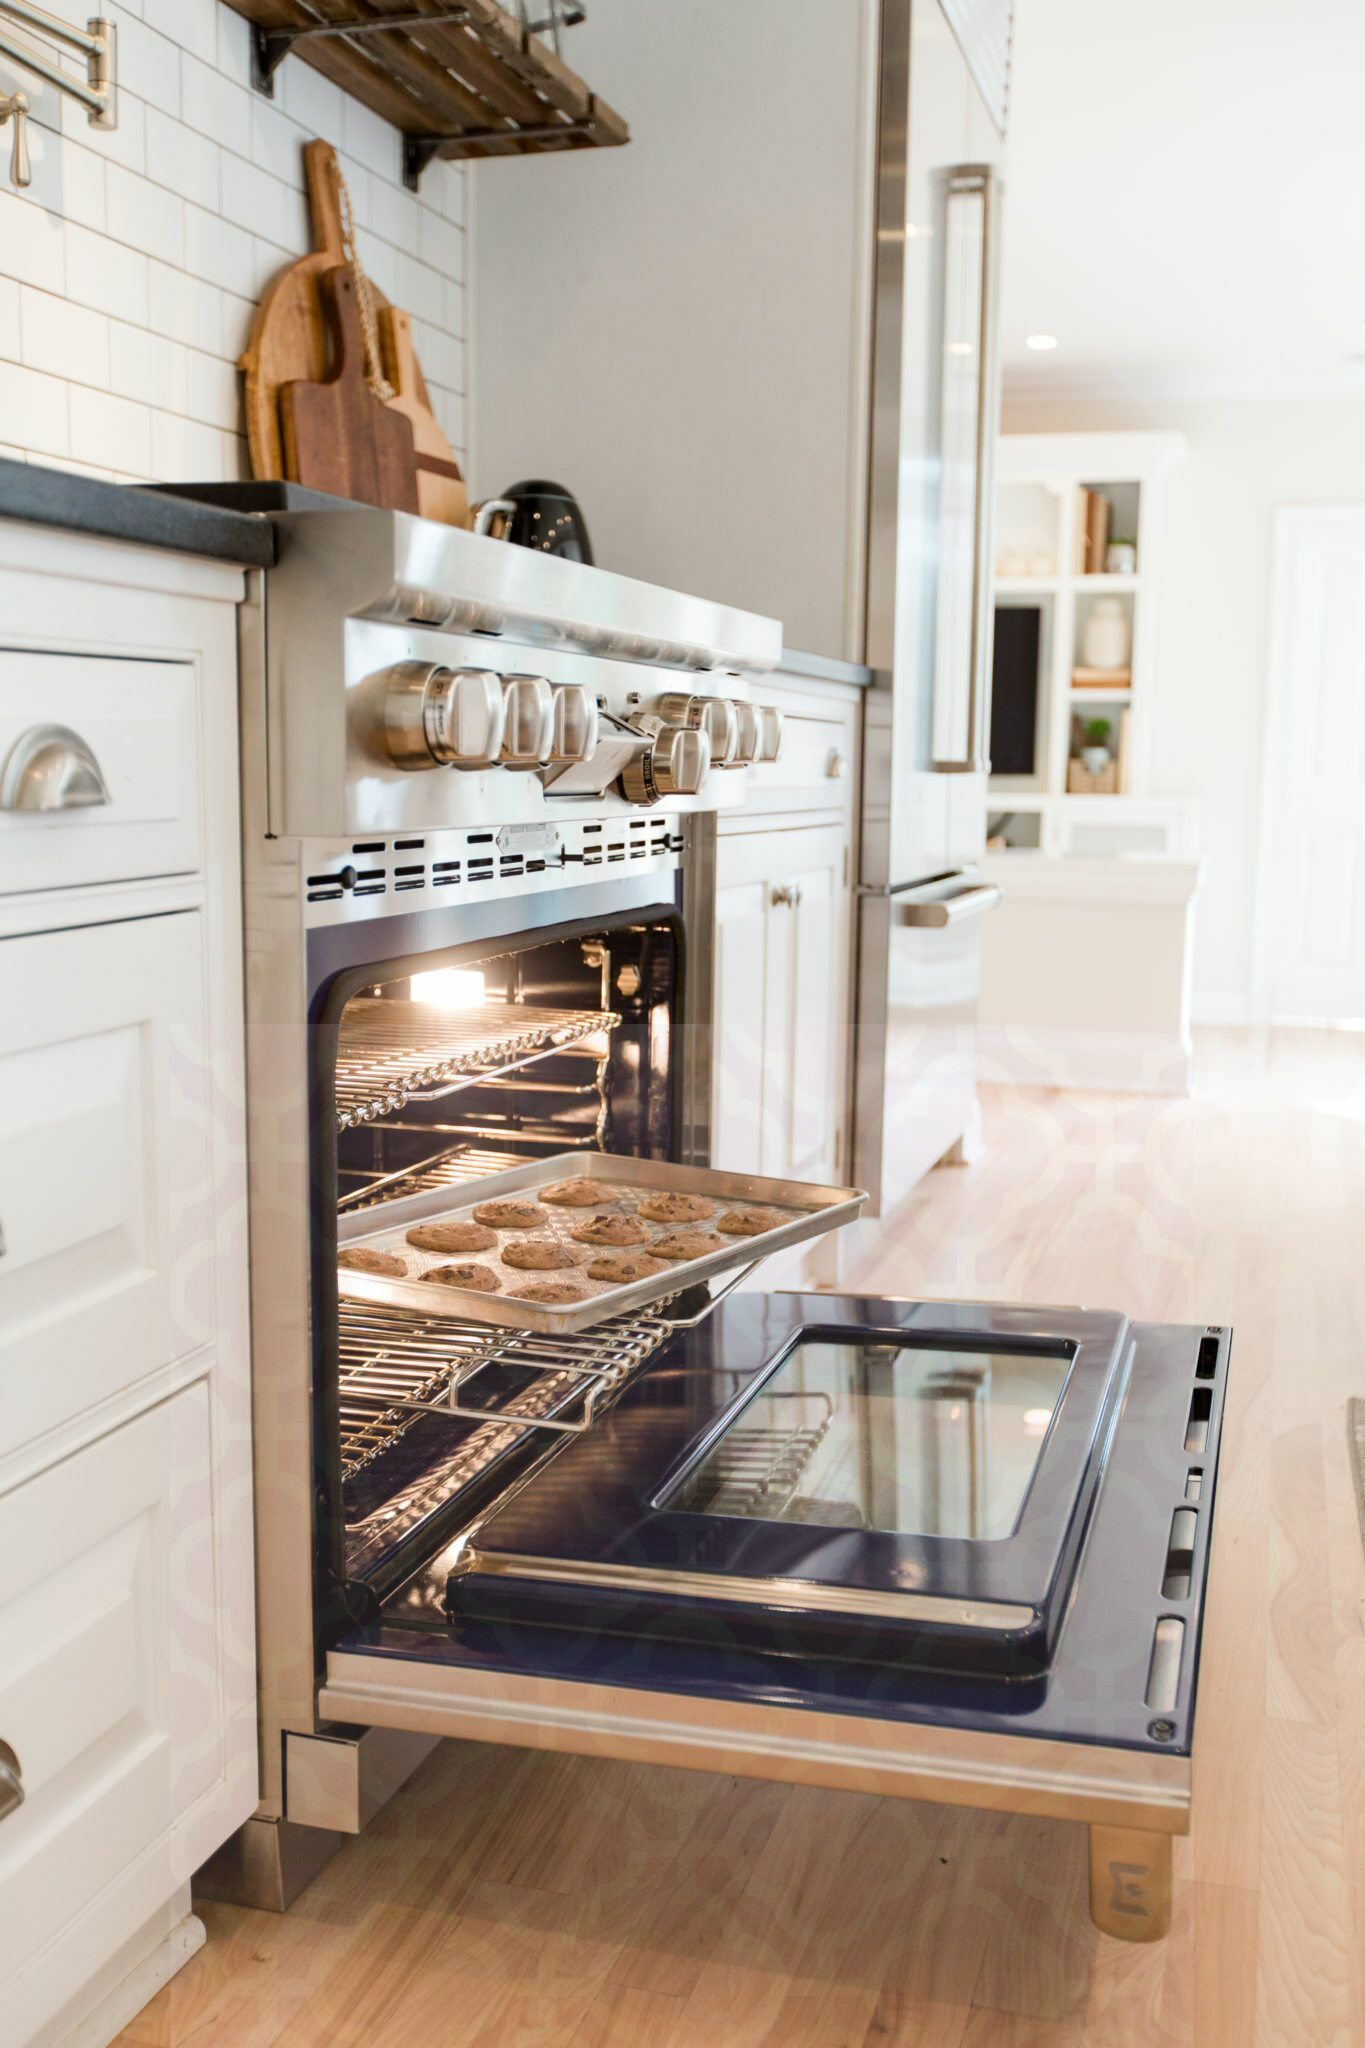 Diy Kitchen Remodel Cost Estimate